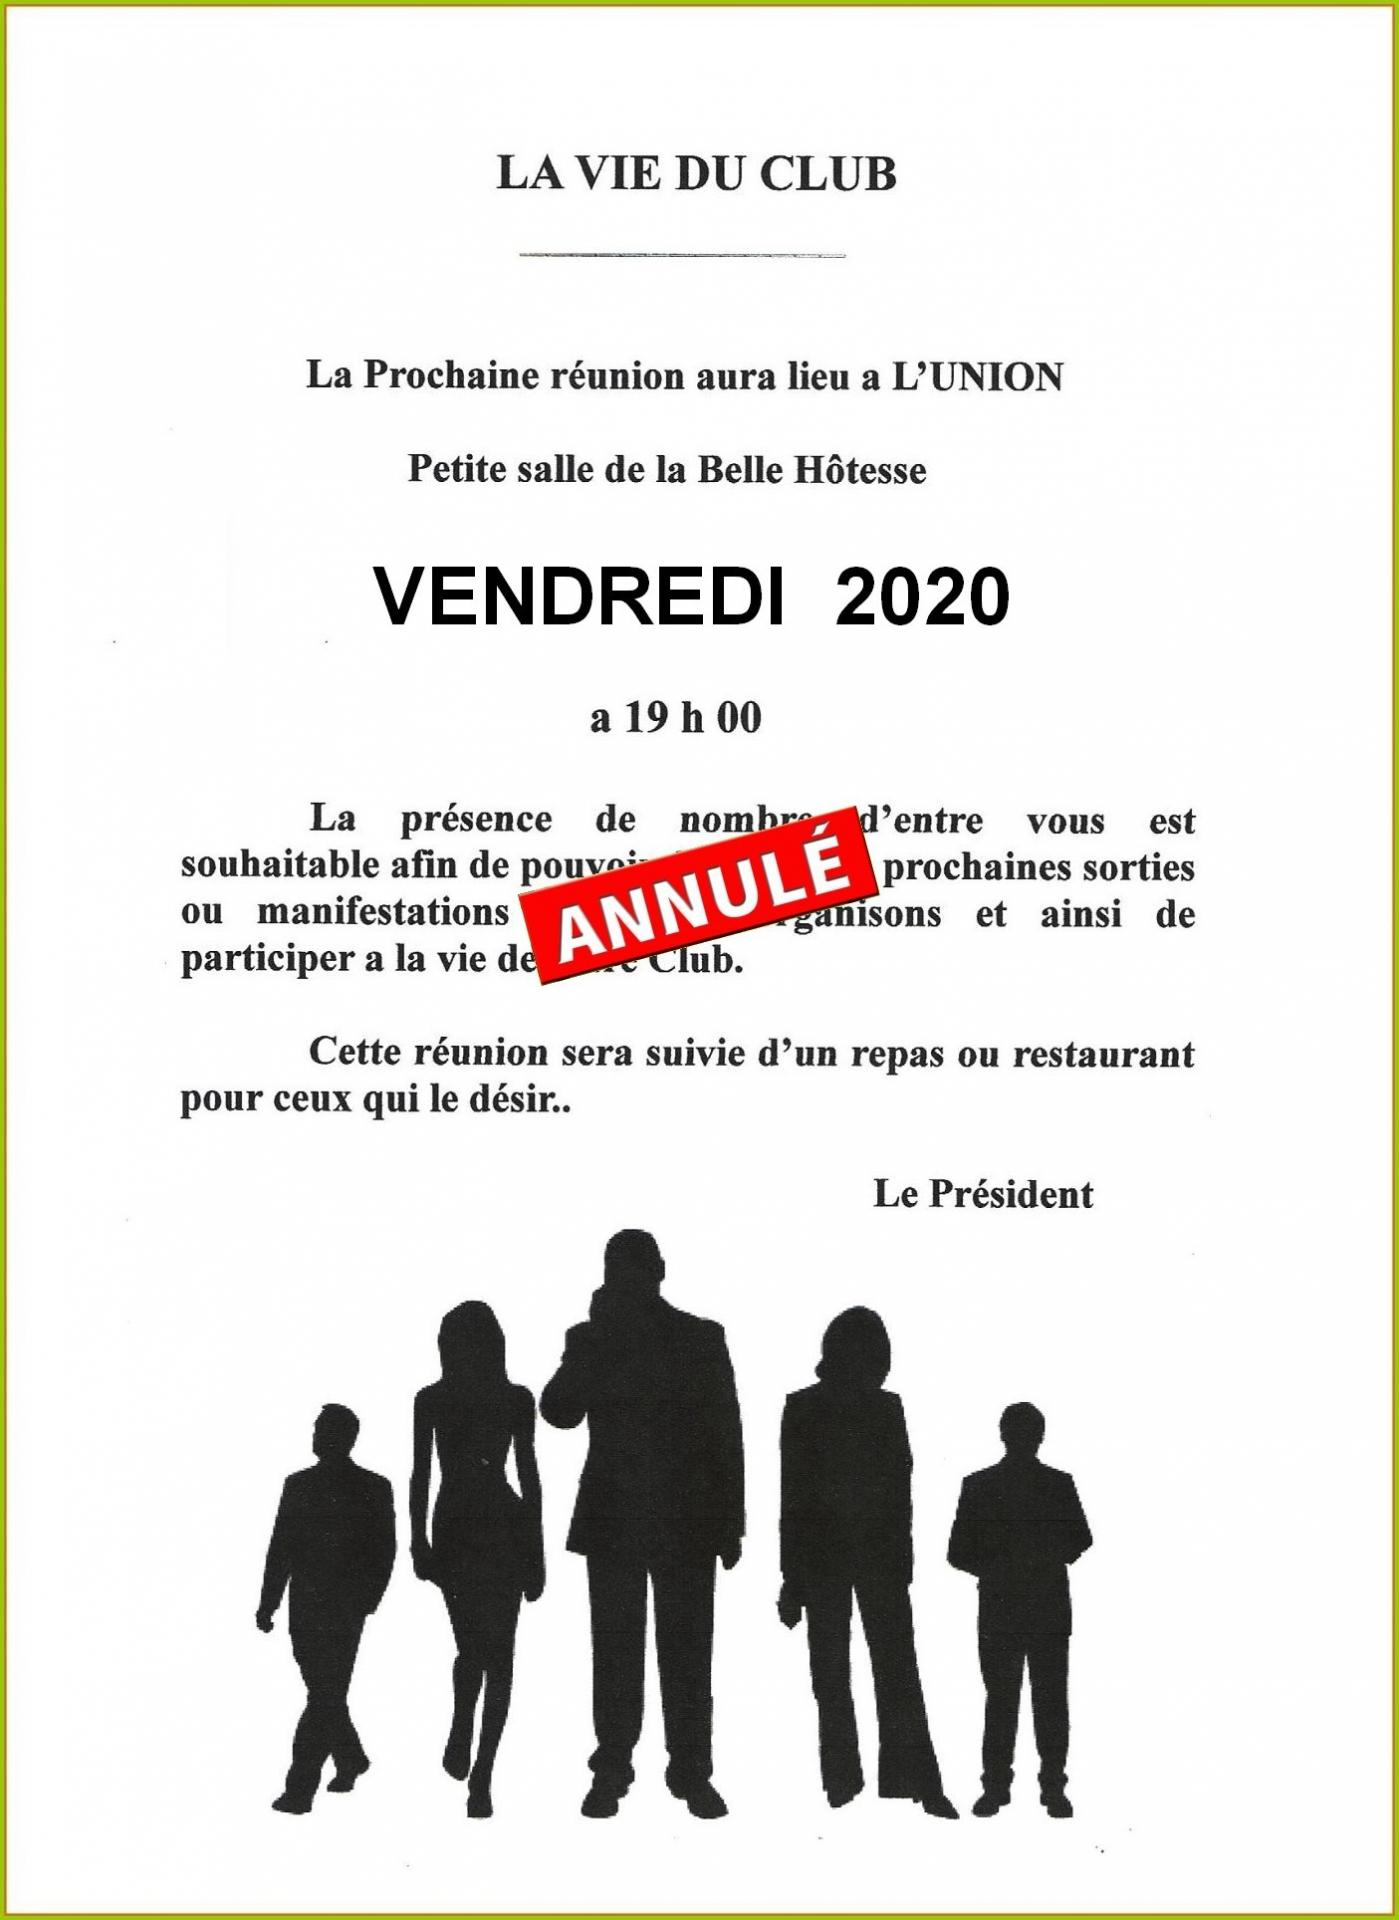 Reunion belle hotesse 2020